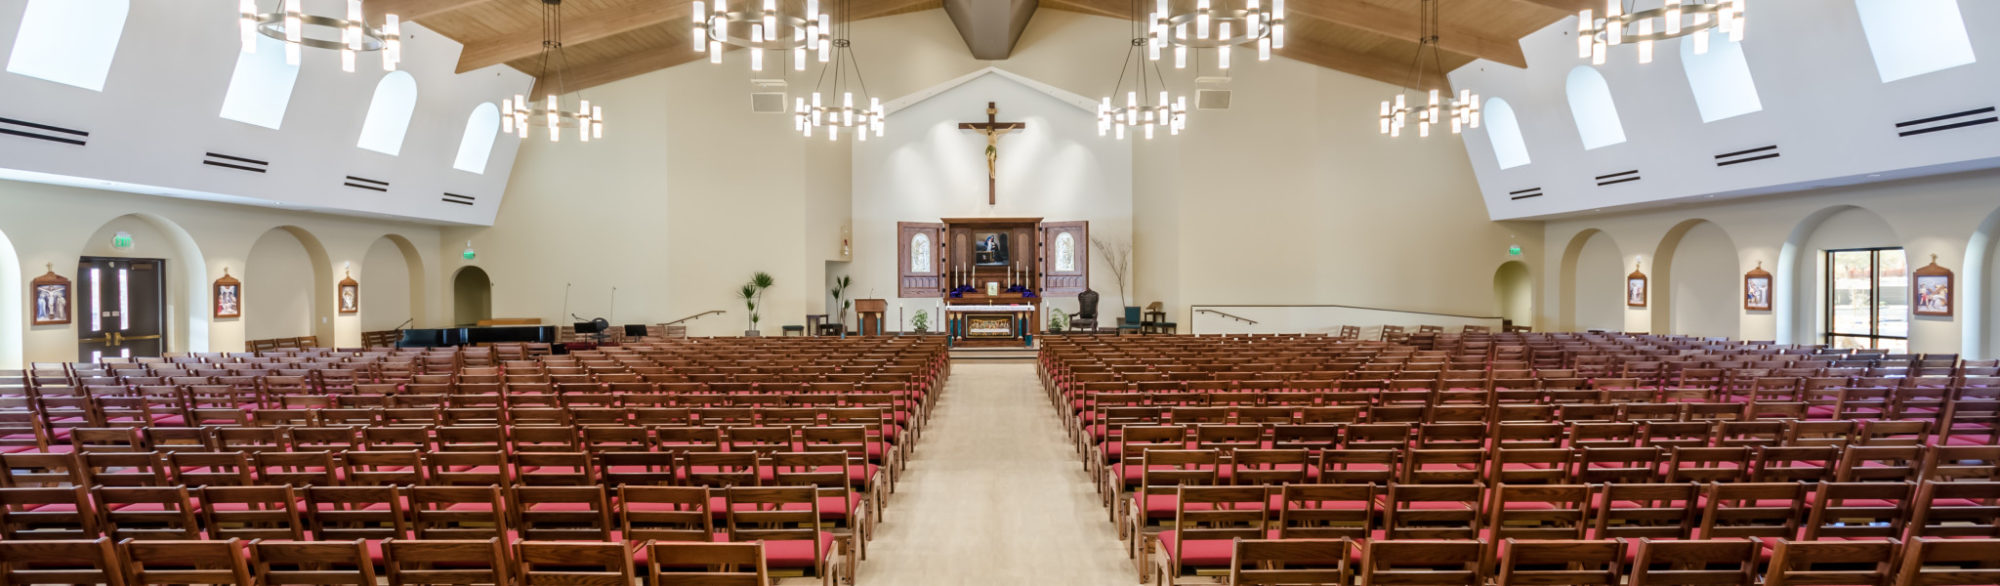 Inside the St. Anthony of Padua Parish Hall, masterplan and design by LGA Architecture.